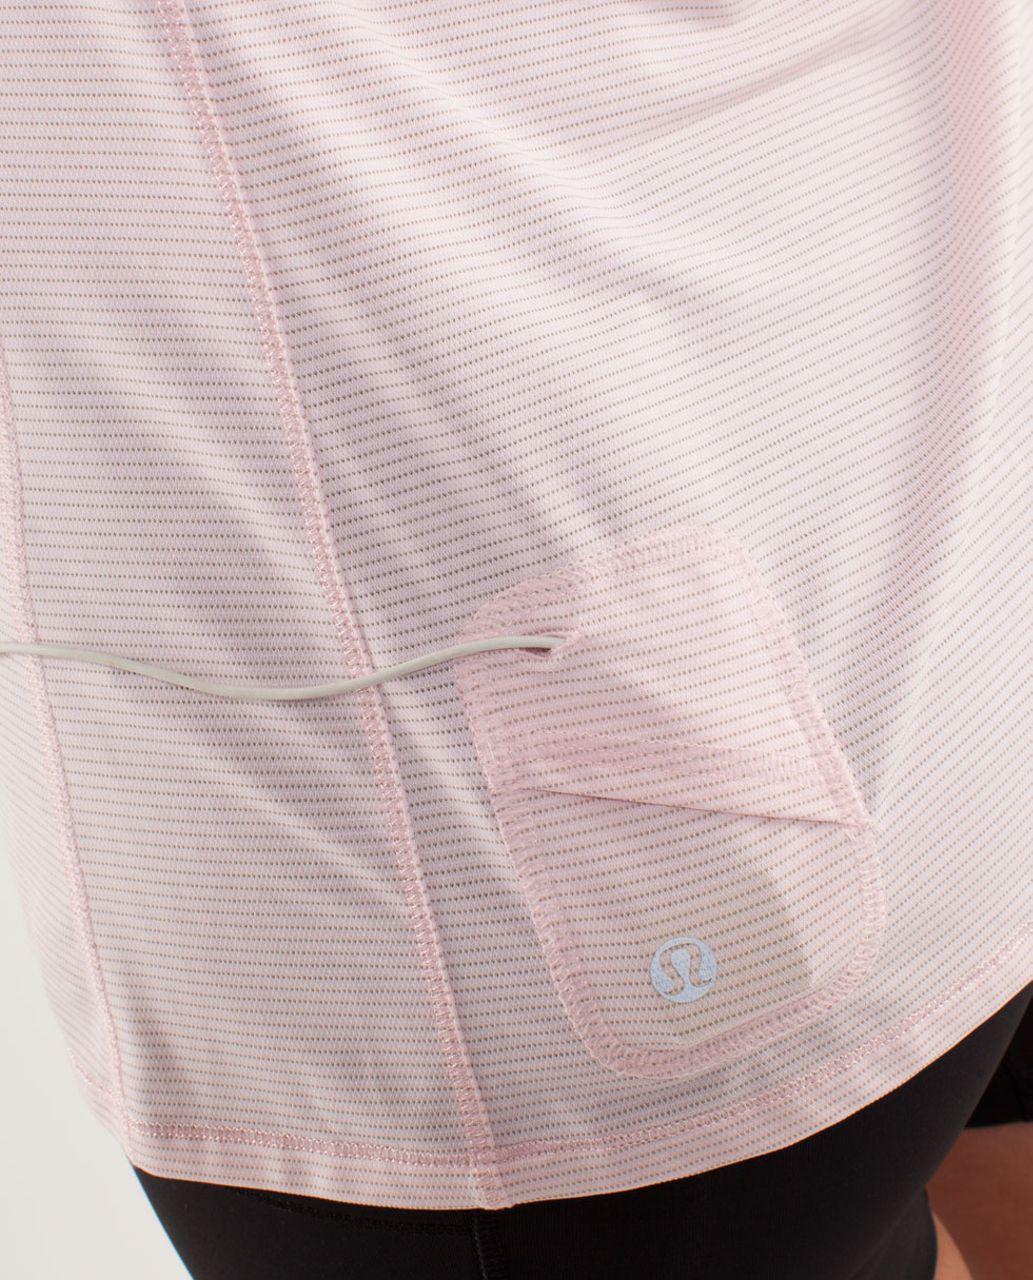 Lululemon Run:  Silver Bullet Sleeveless Tech - Blush Quartz /  Cut-out Lace Reflective Print